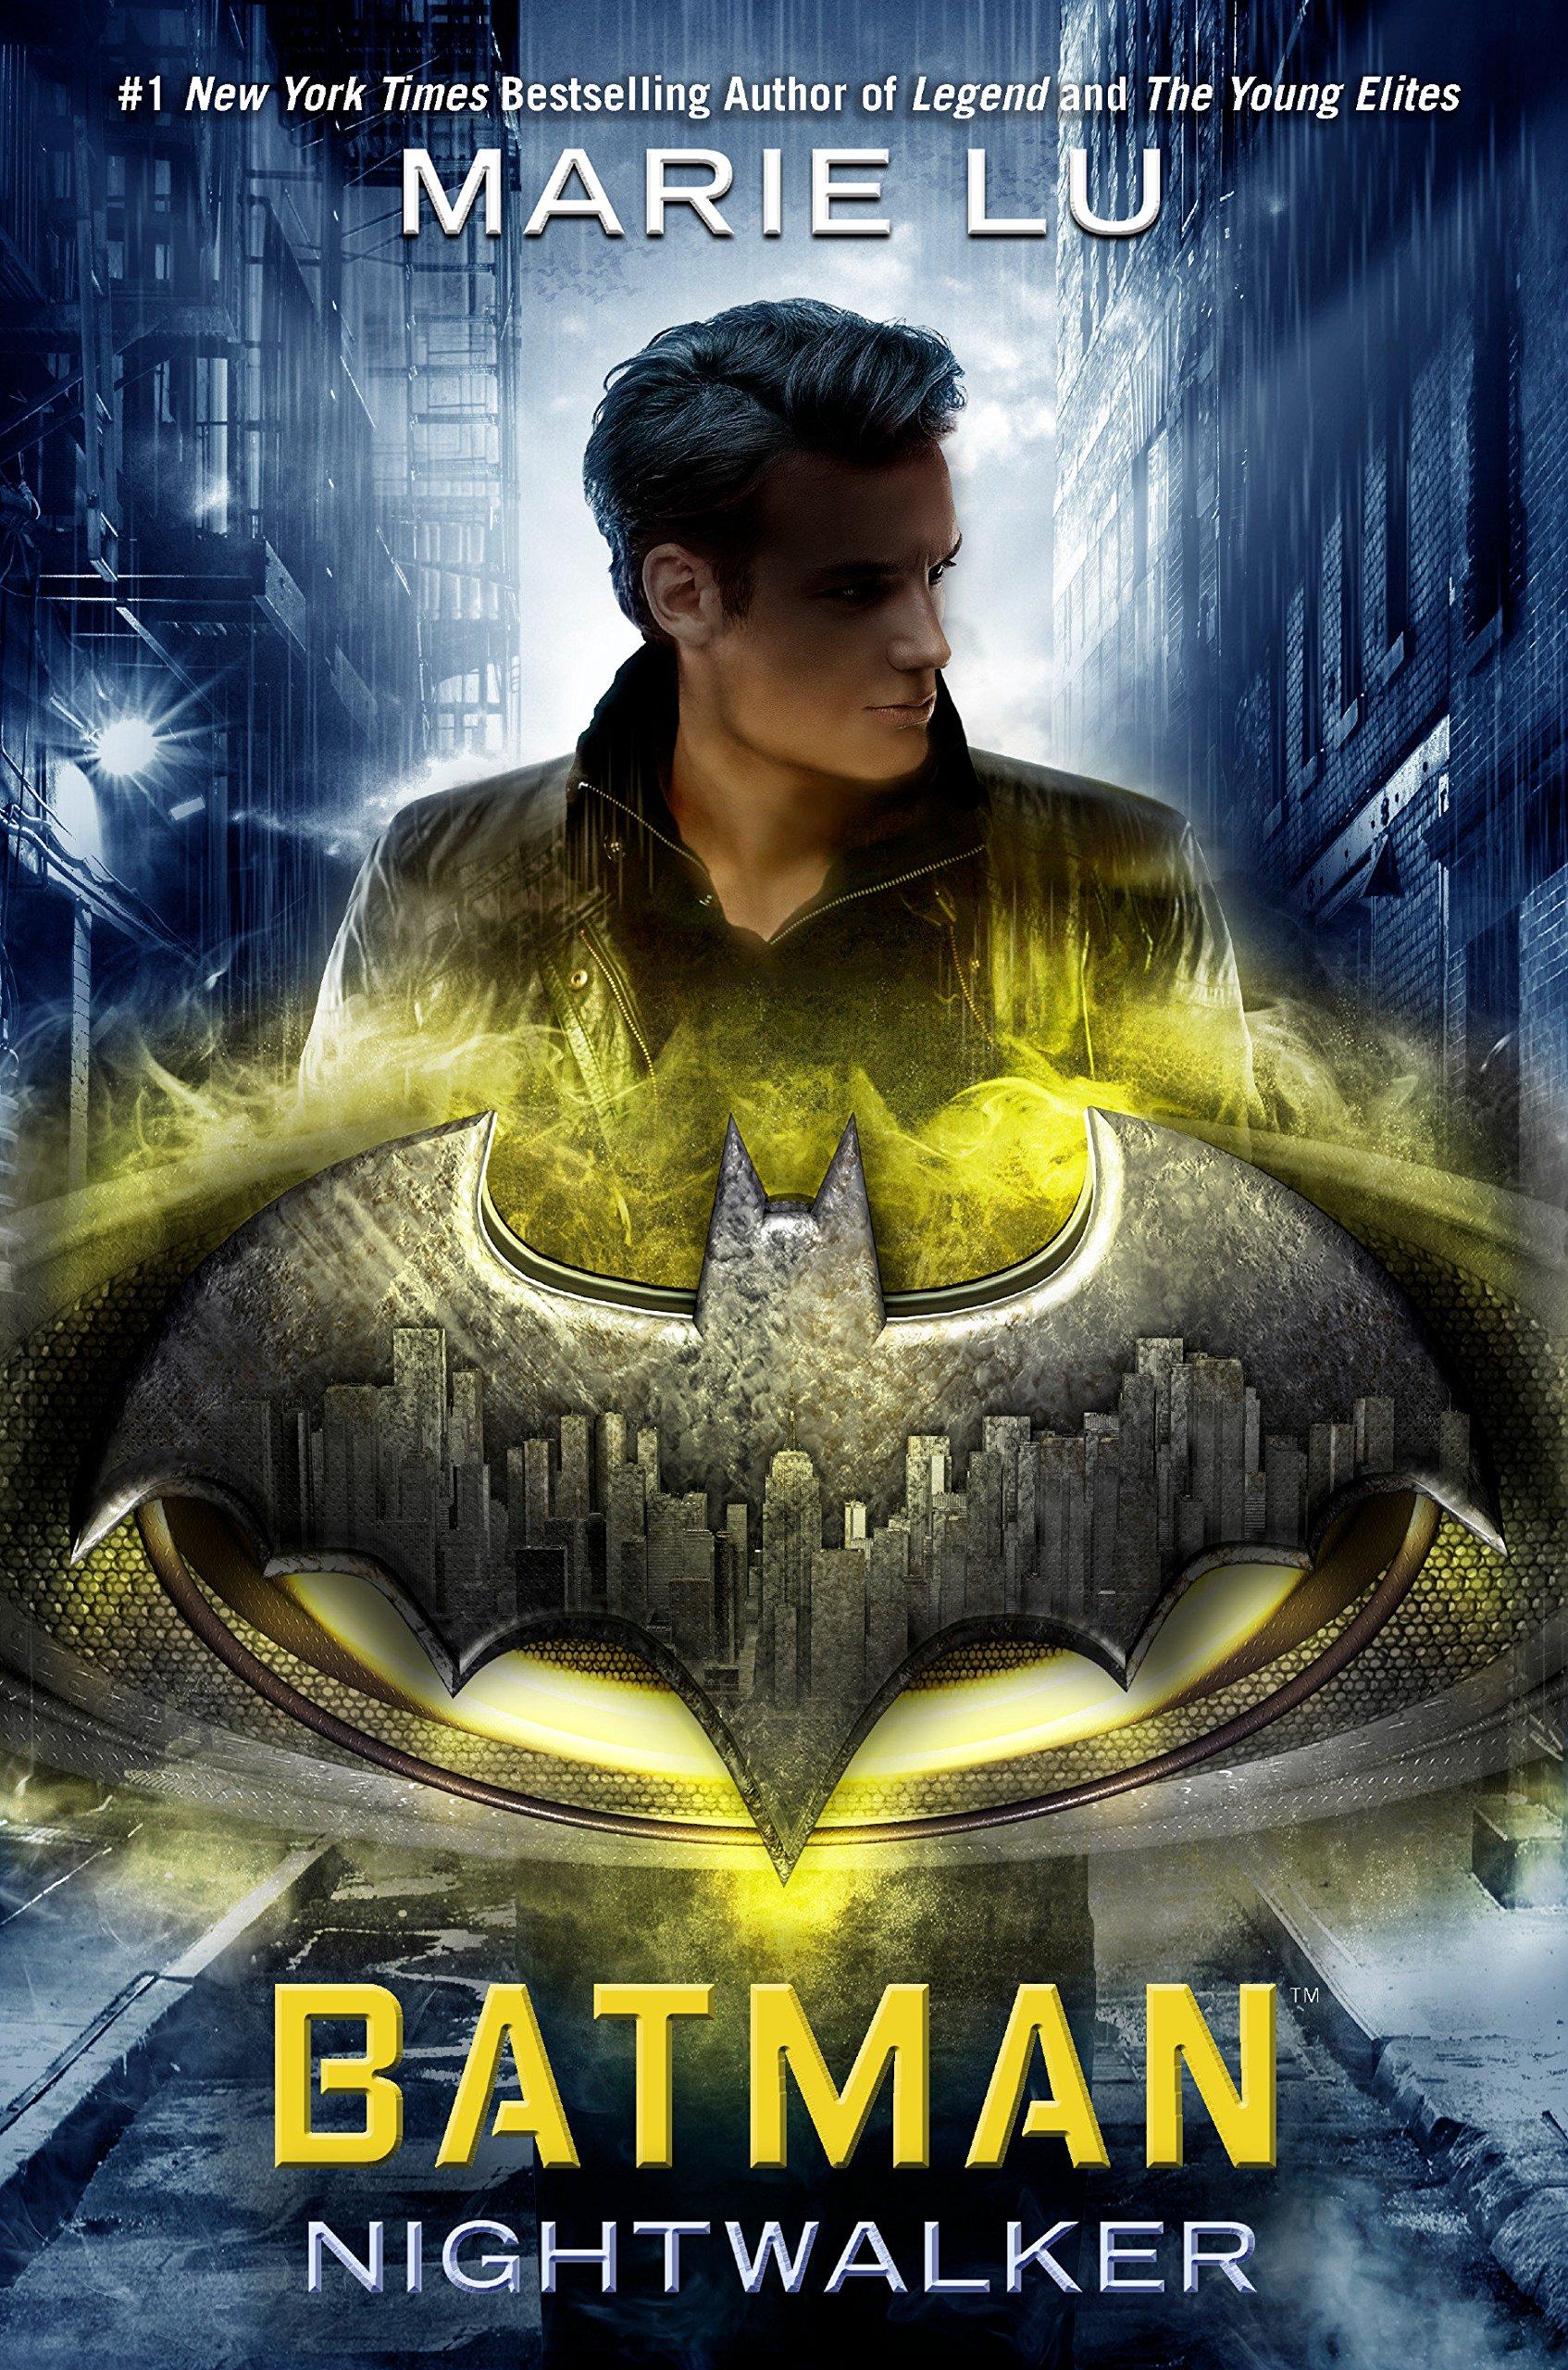 Image result for batman nightwalker marie lu